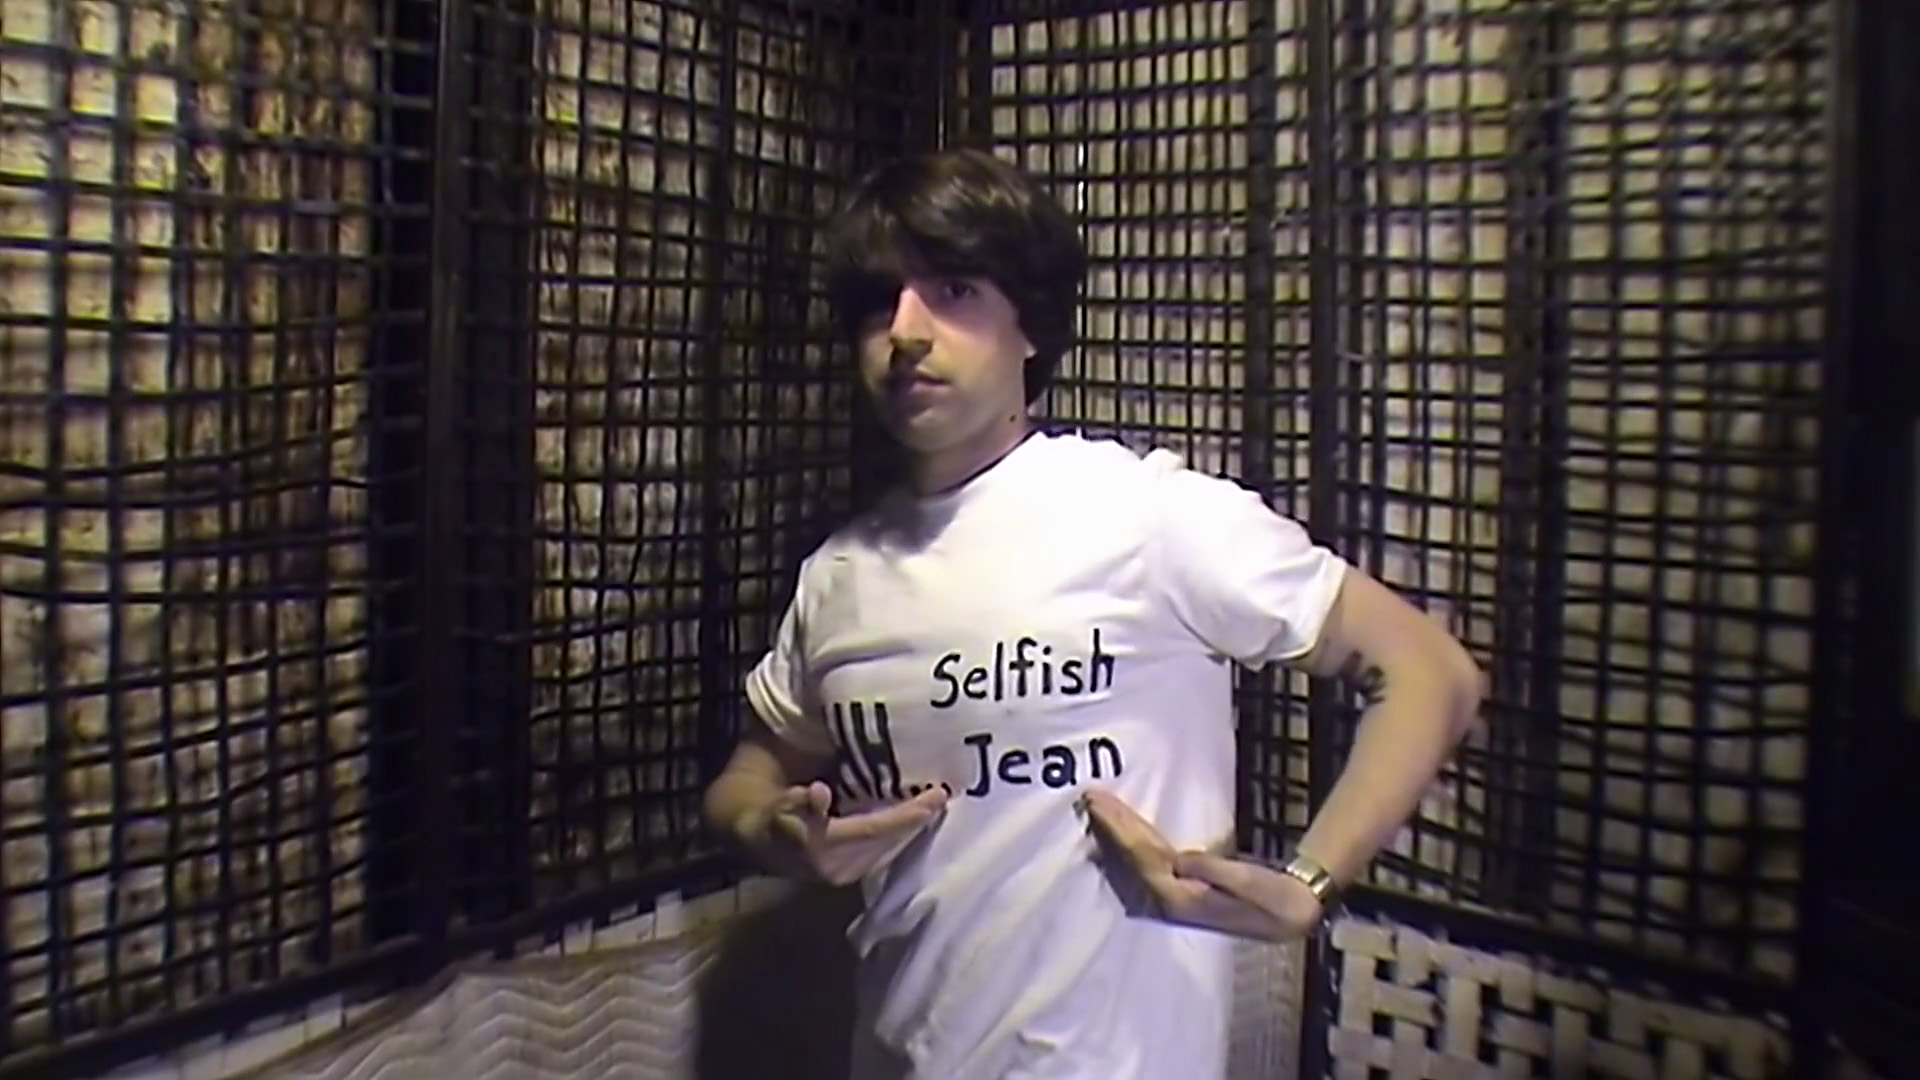 Travis - Selfish Jean